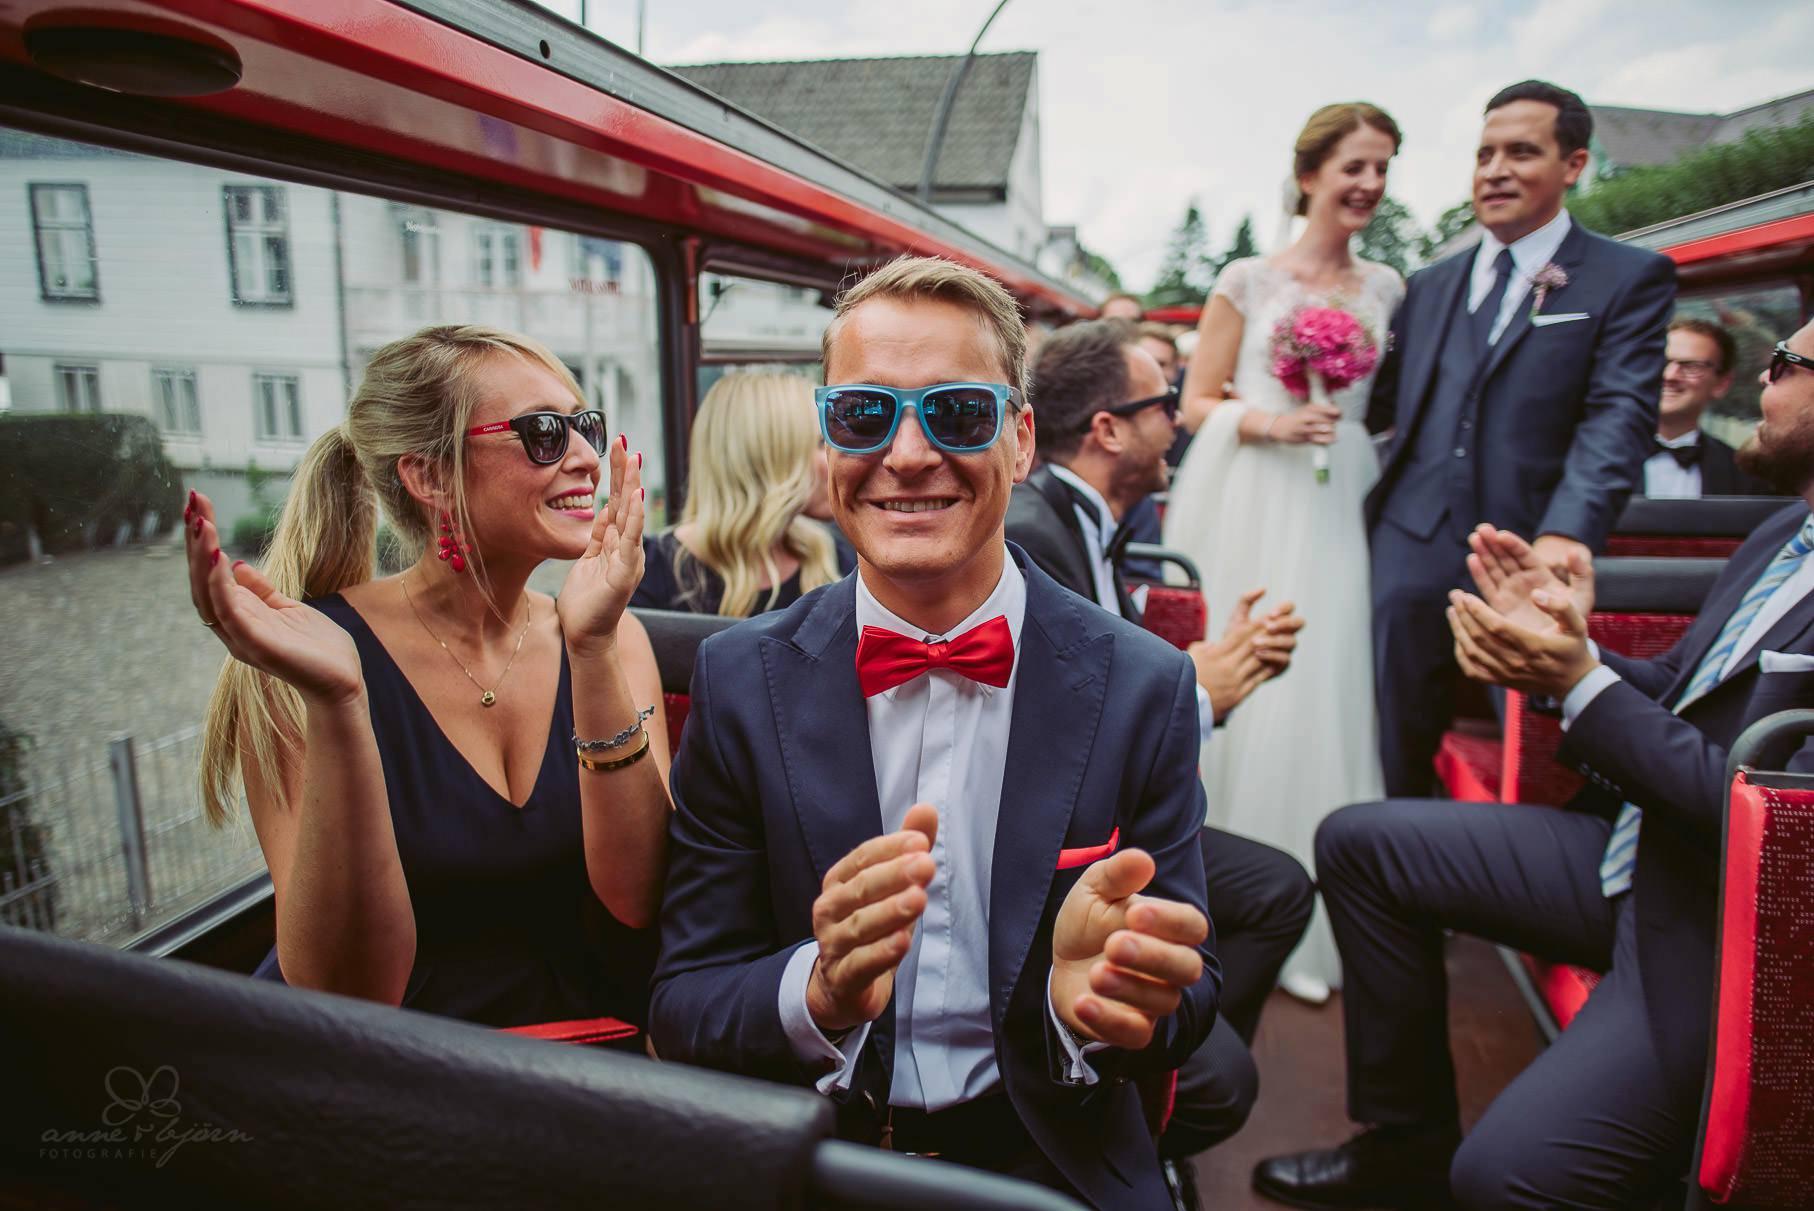 0048 aud blog 811 0339 - Hochzeit an der Hamburger Elbe - Ann-Katrin & Daniel